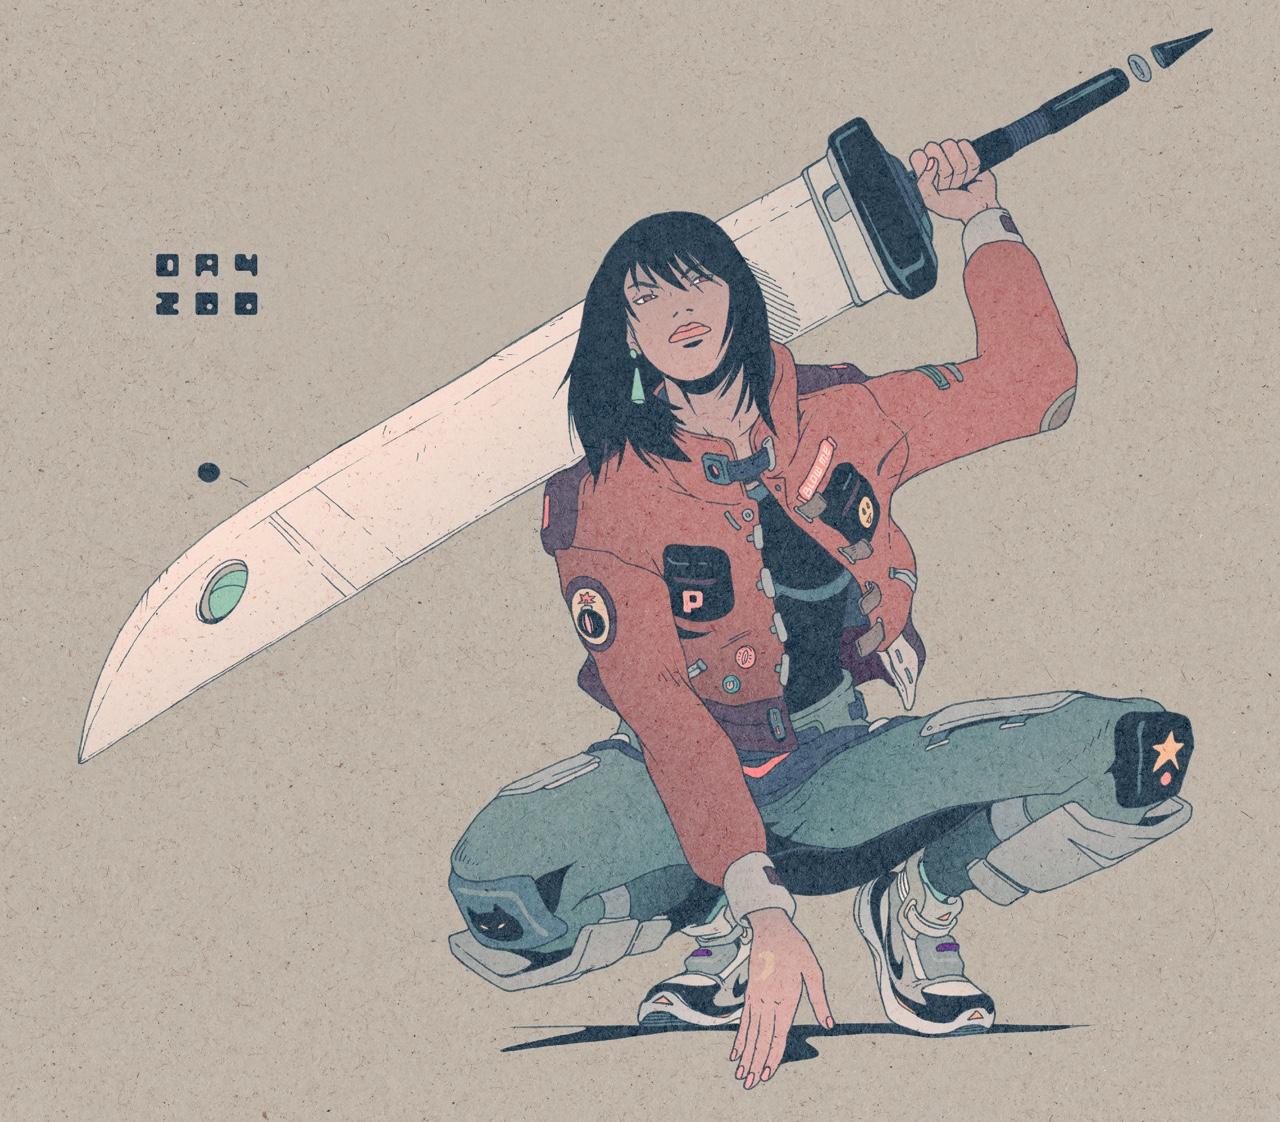 dirty-robot-daniel-isles-futurism-sci-fi-ficcao-cientifica-arte-ilustracao-quadrinhos- (19)